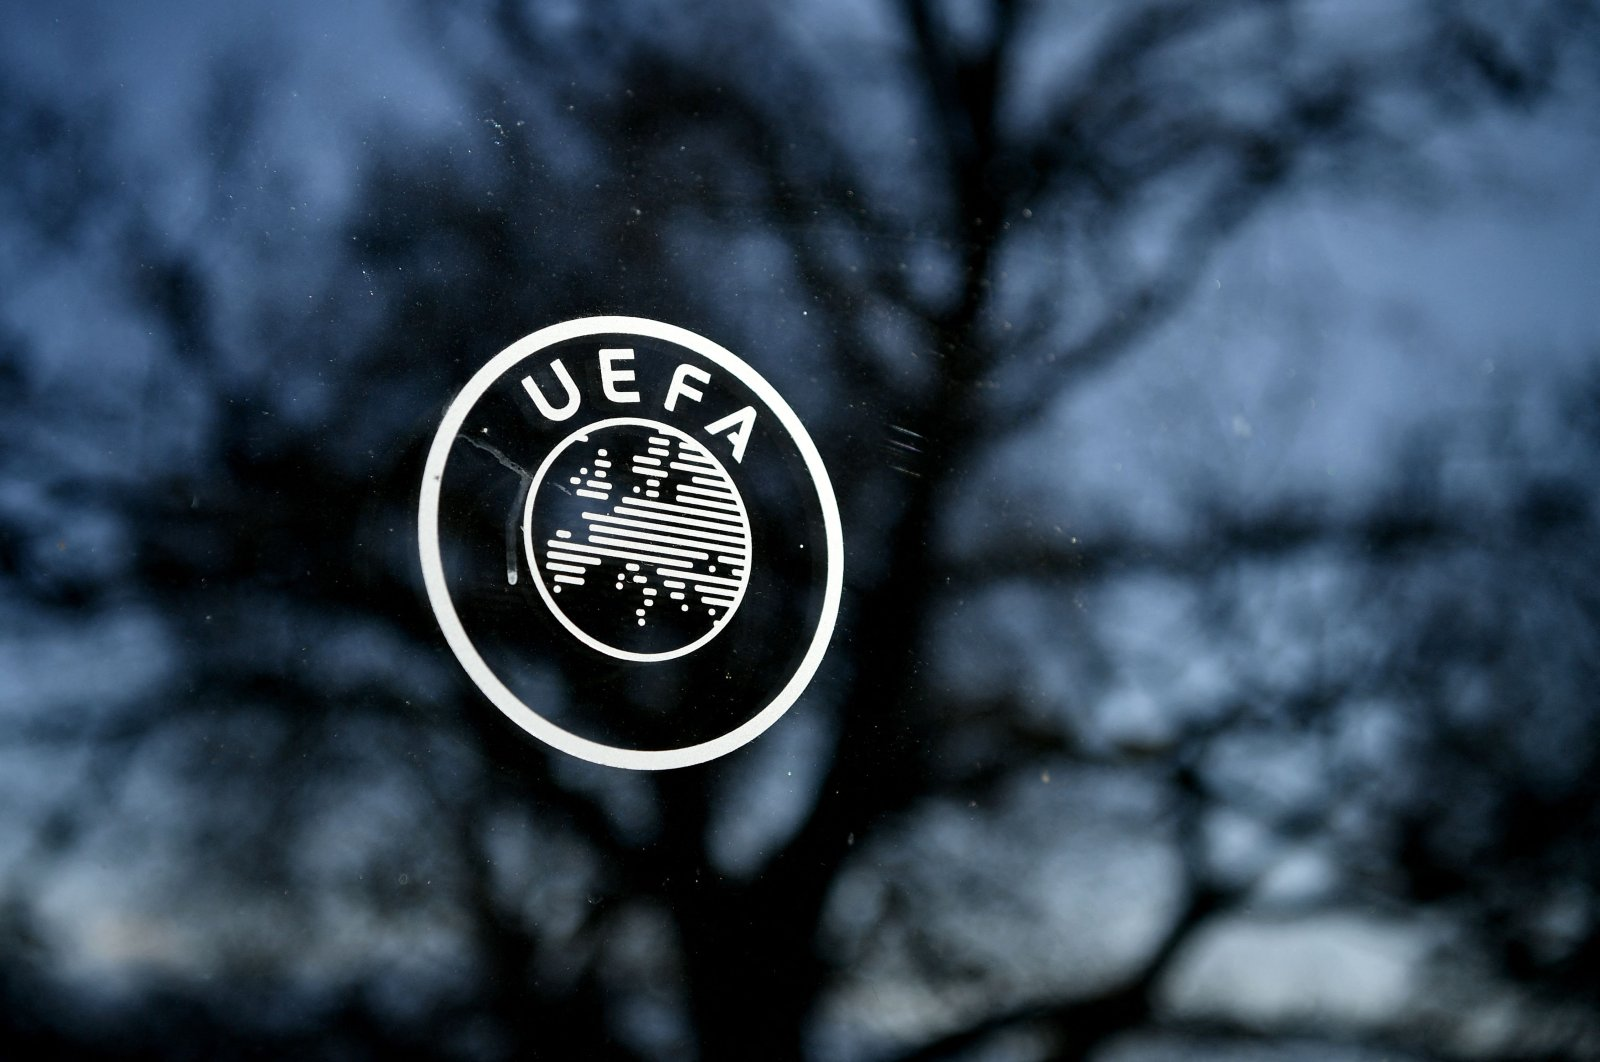 The UEFA logo at the organization's headquarters in Nyon, Switzerland, Feb. 28, 2020. (AFP Photo)